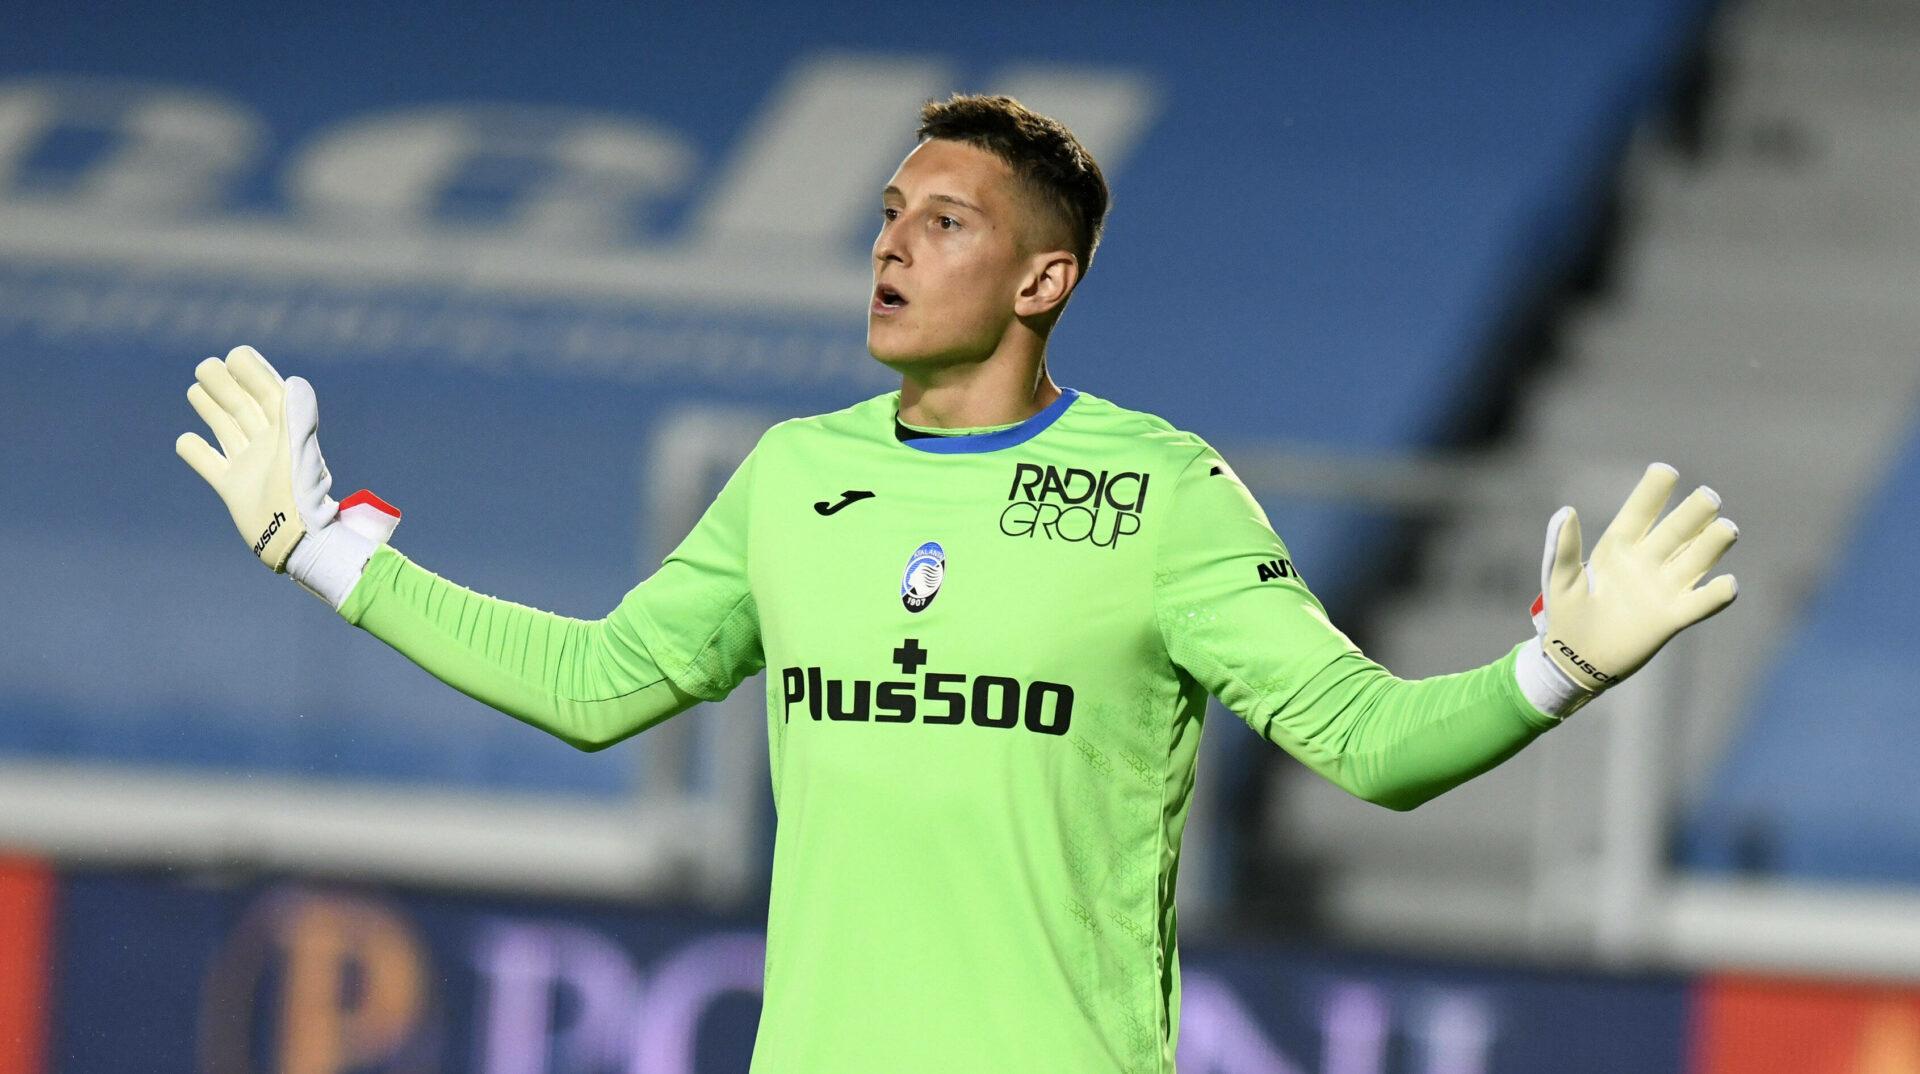 Bestätigt: Tottenham verpflichtet Atalanta-Keeper Gollini